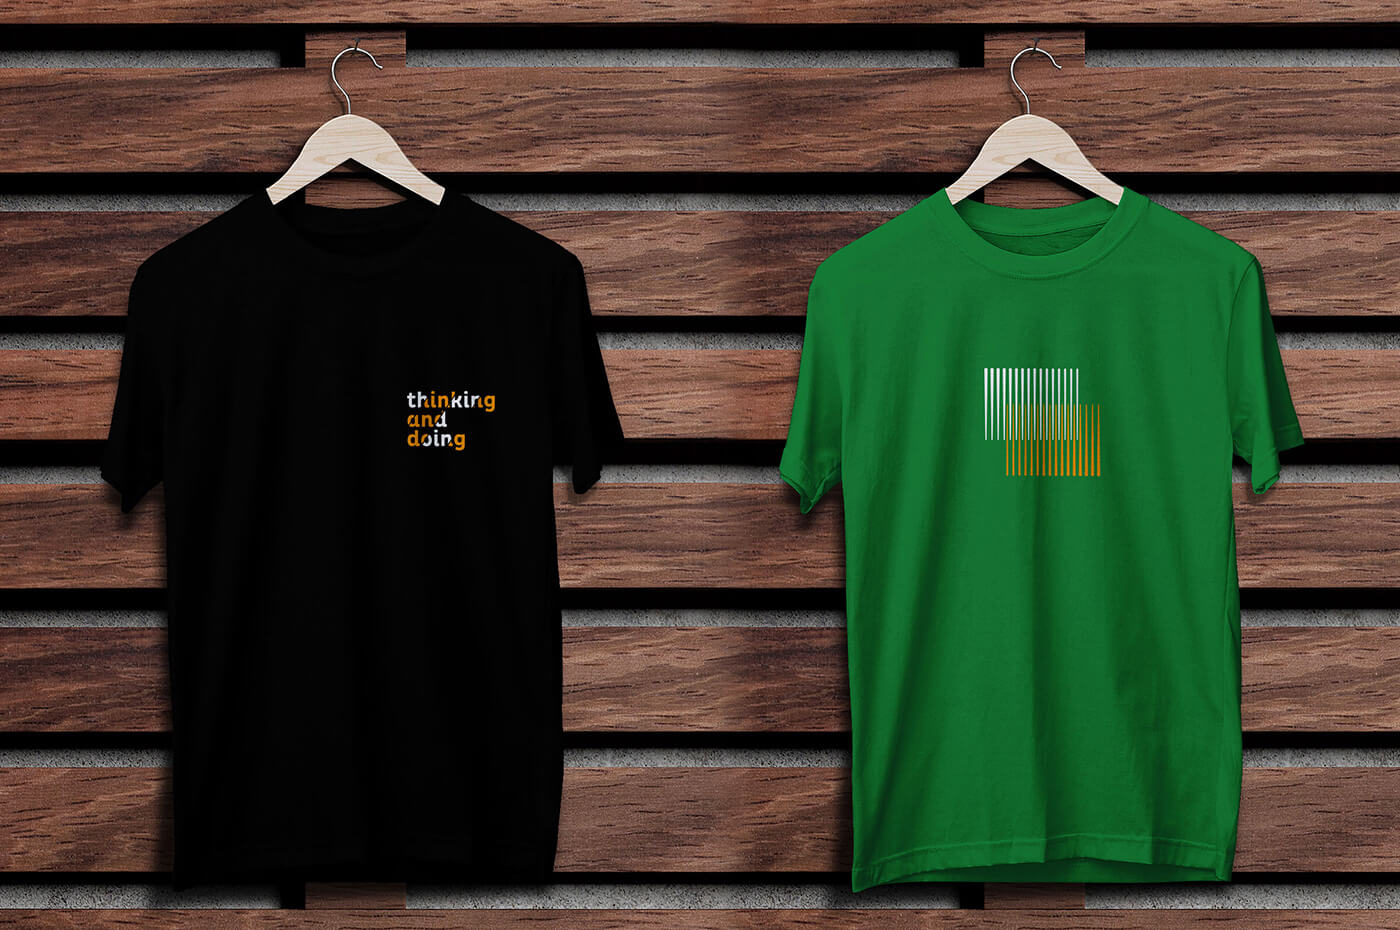 https://www.rafaeloliveira.com/portfolio/r21-camisetas-2020